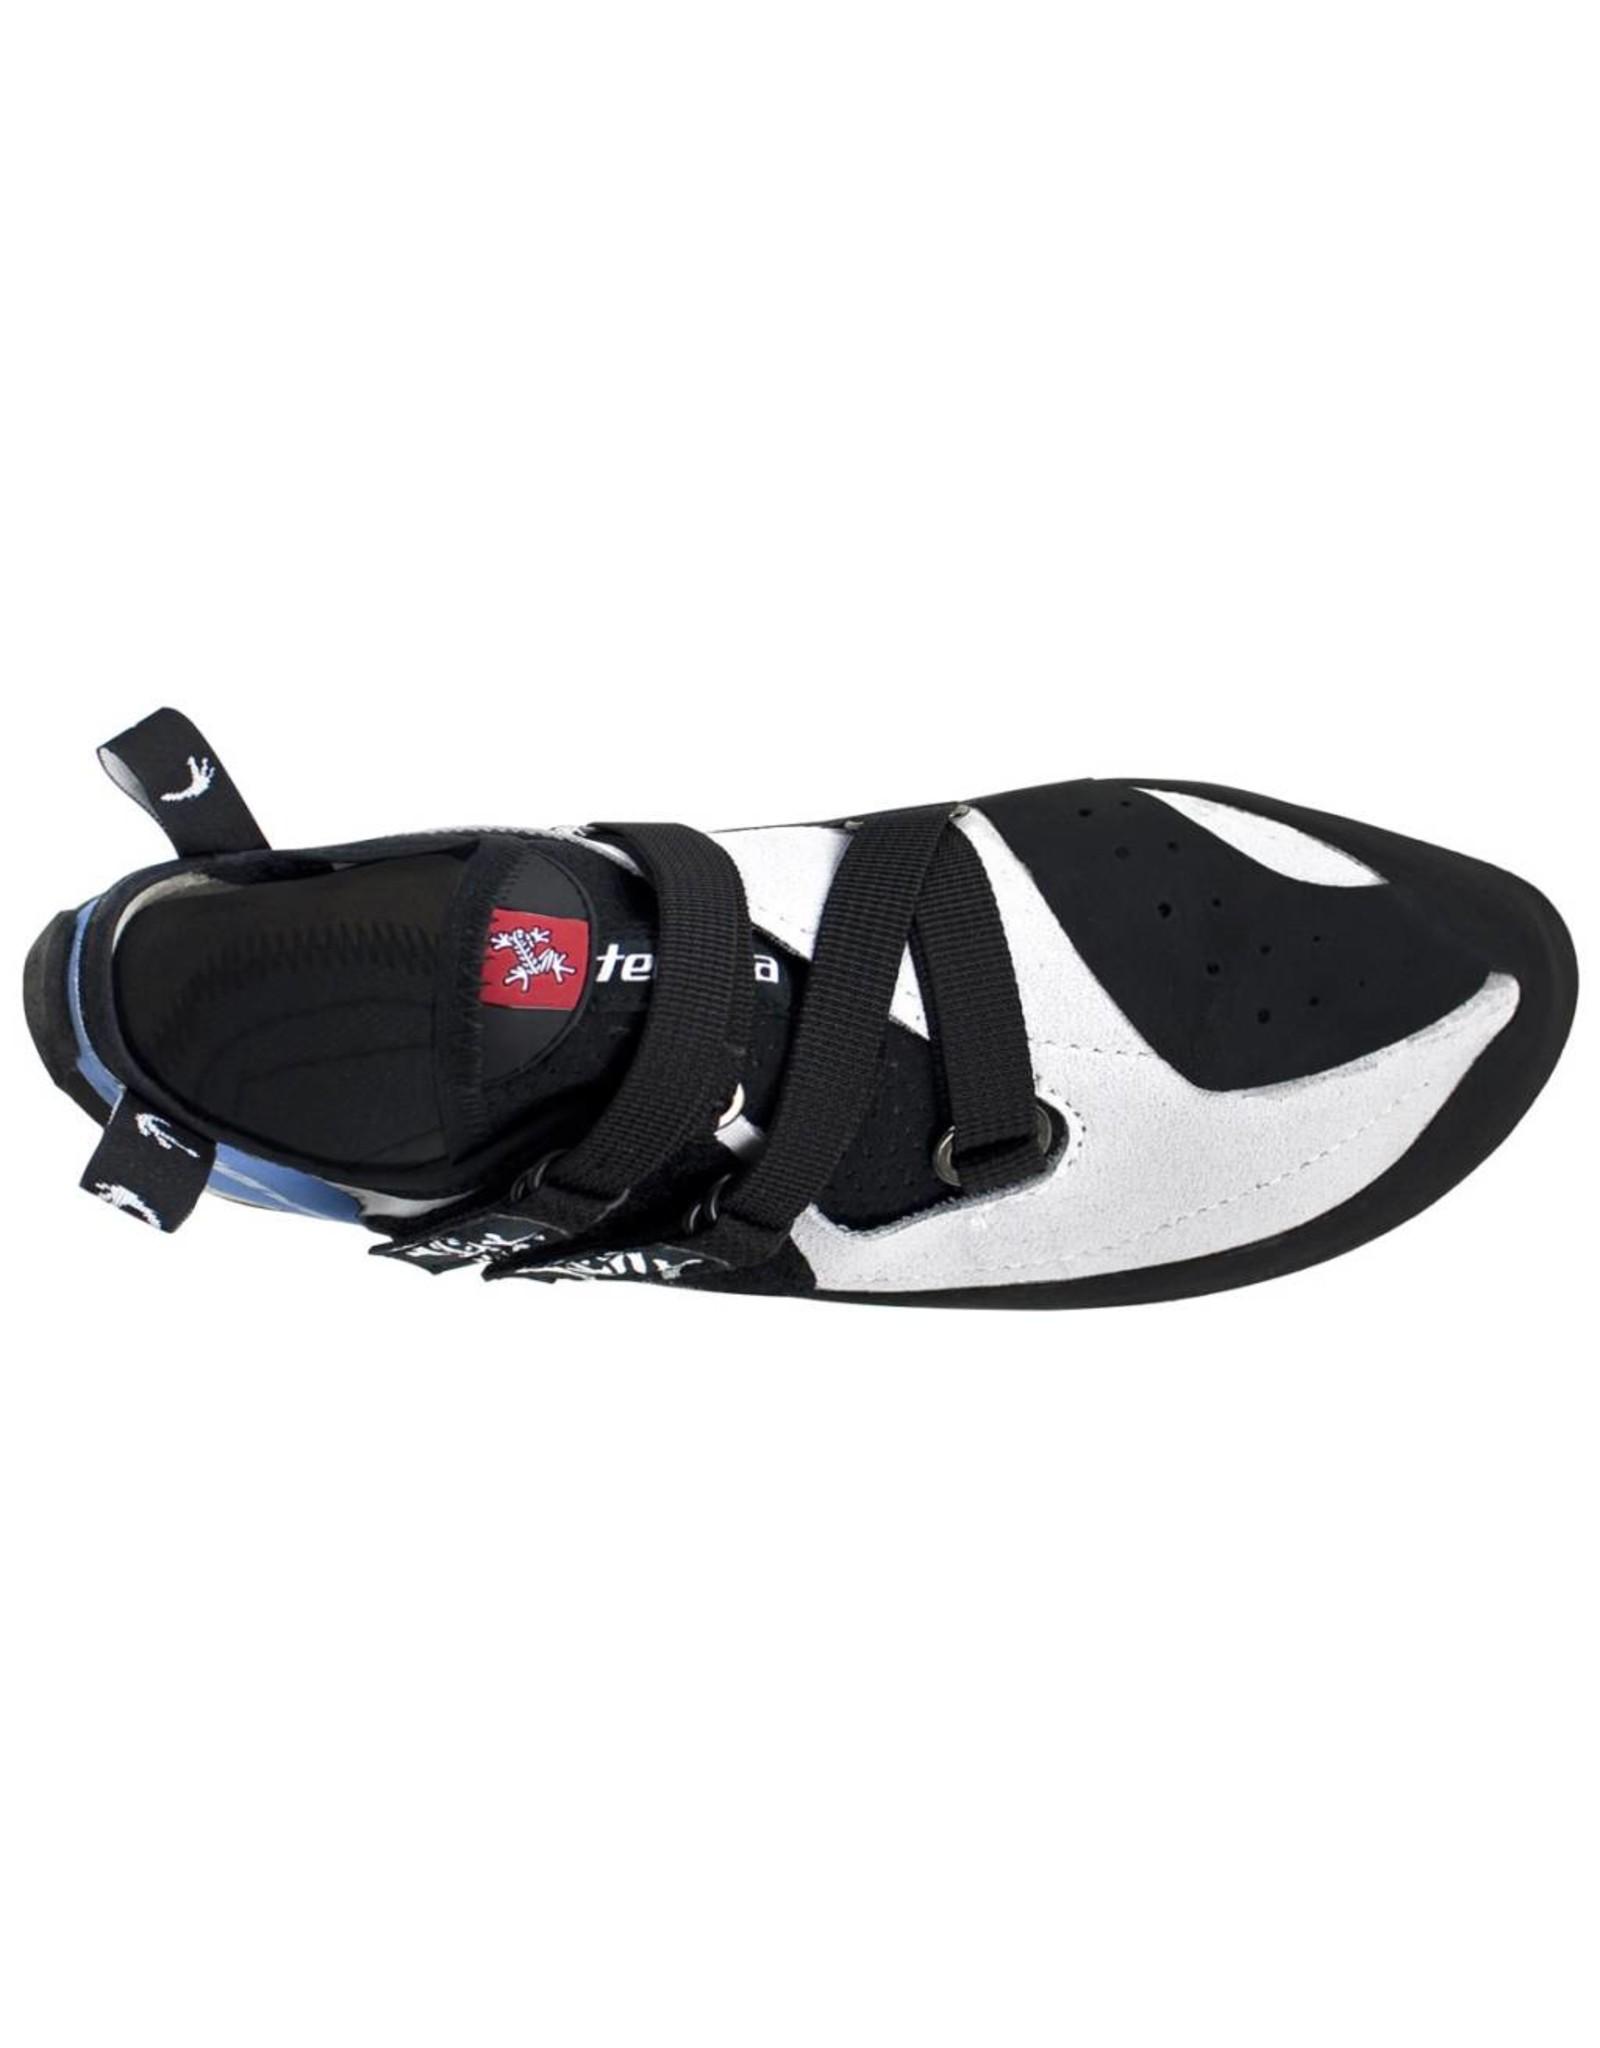 Tenaya Tenaya Oasi Climbing Shoes - Unisex